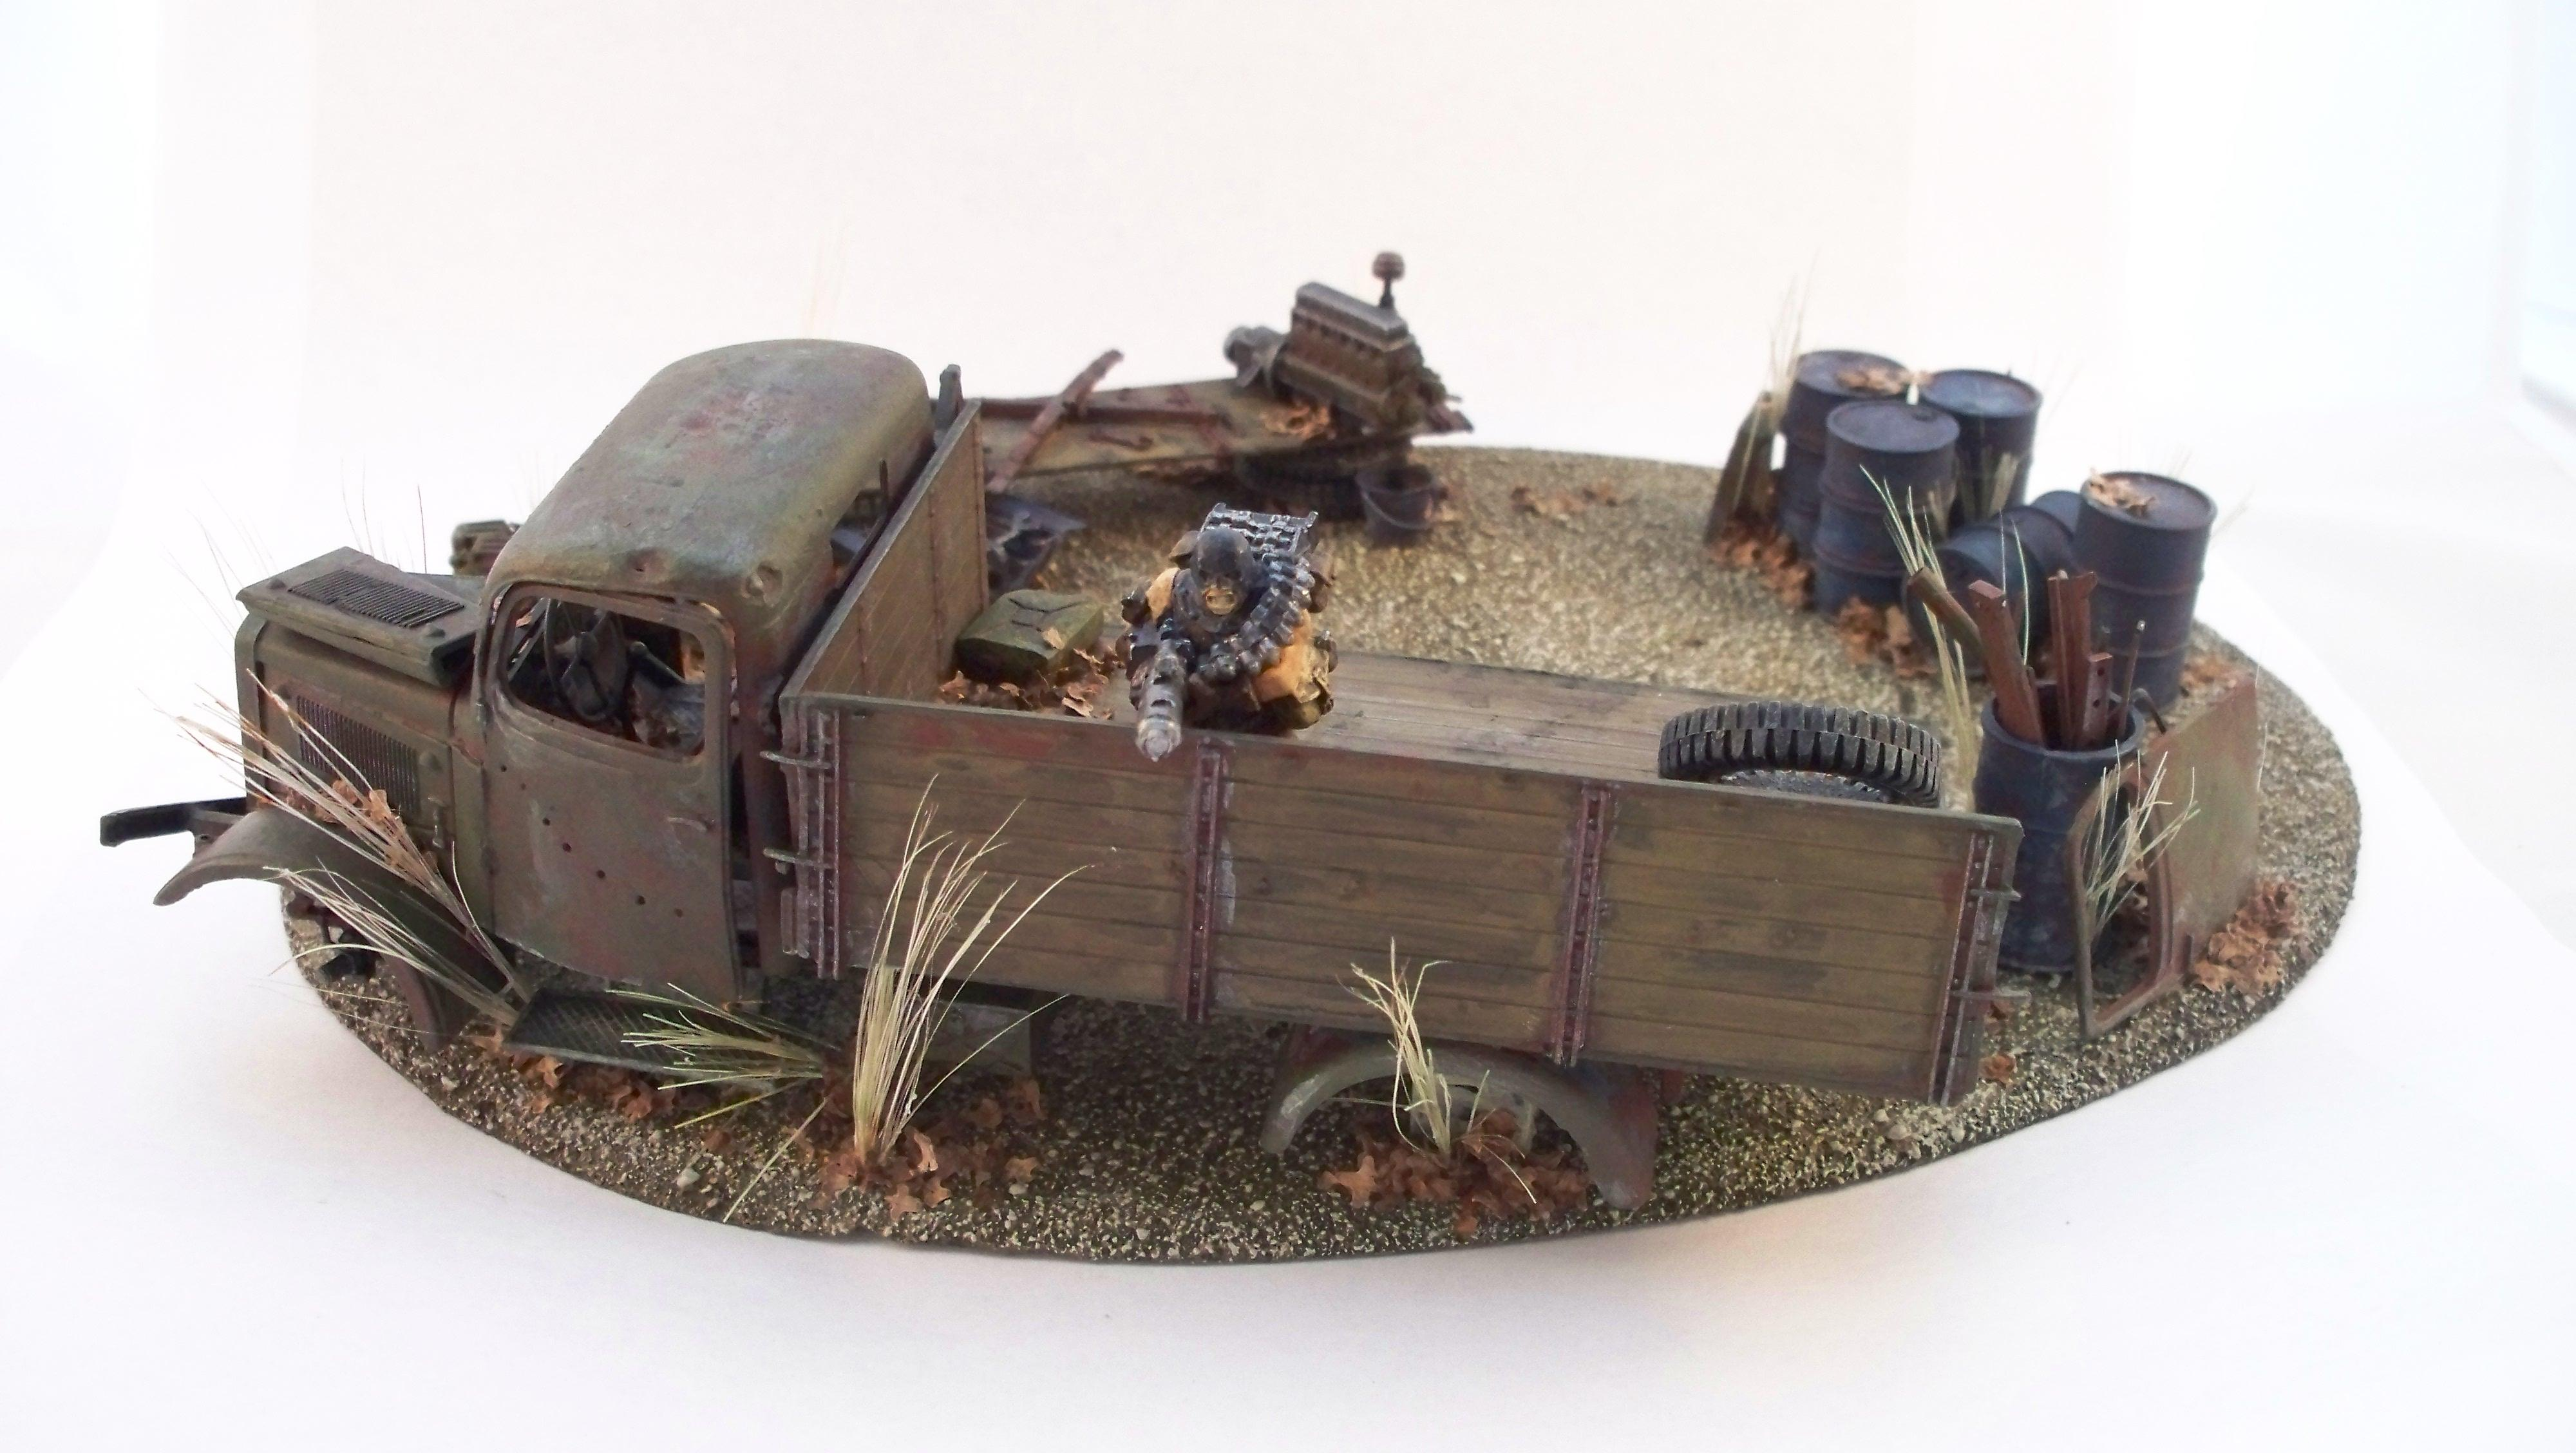 Abandoned, Scrap, Terrain, Truck